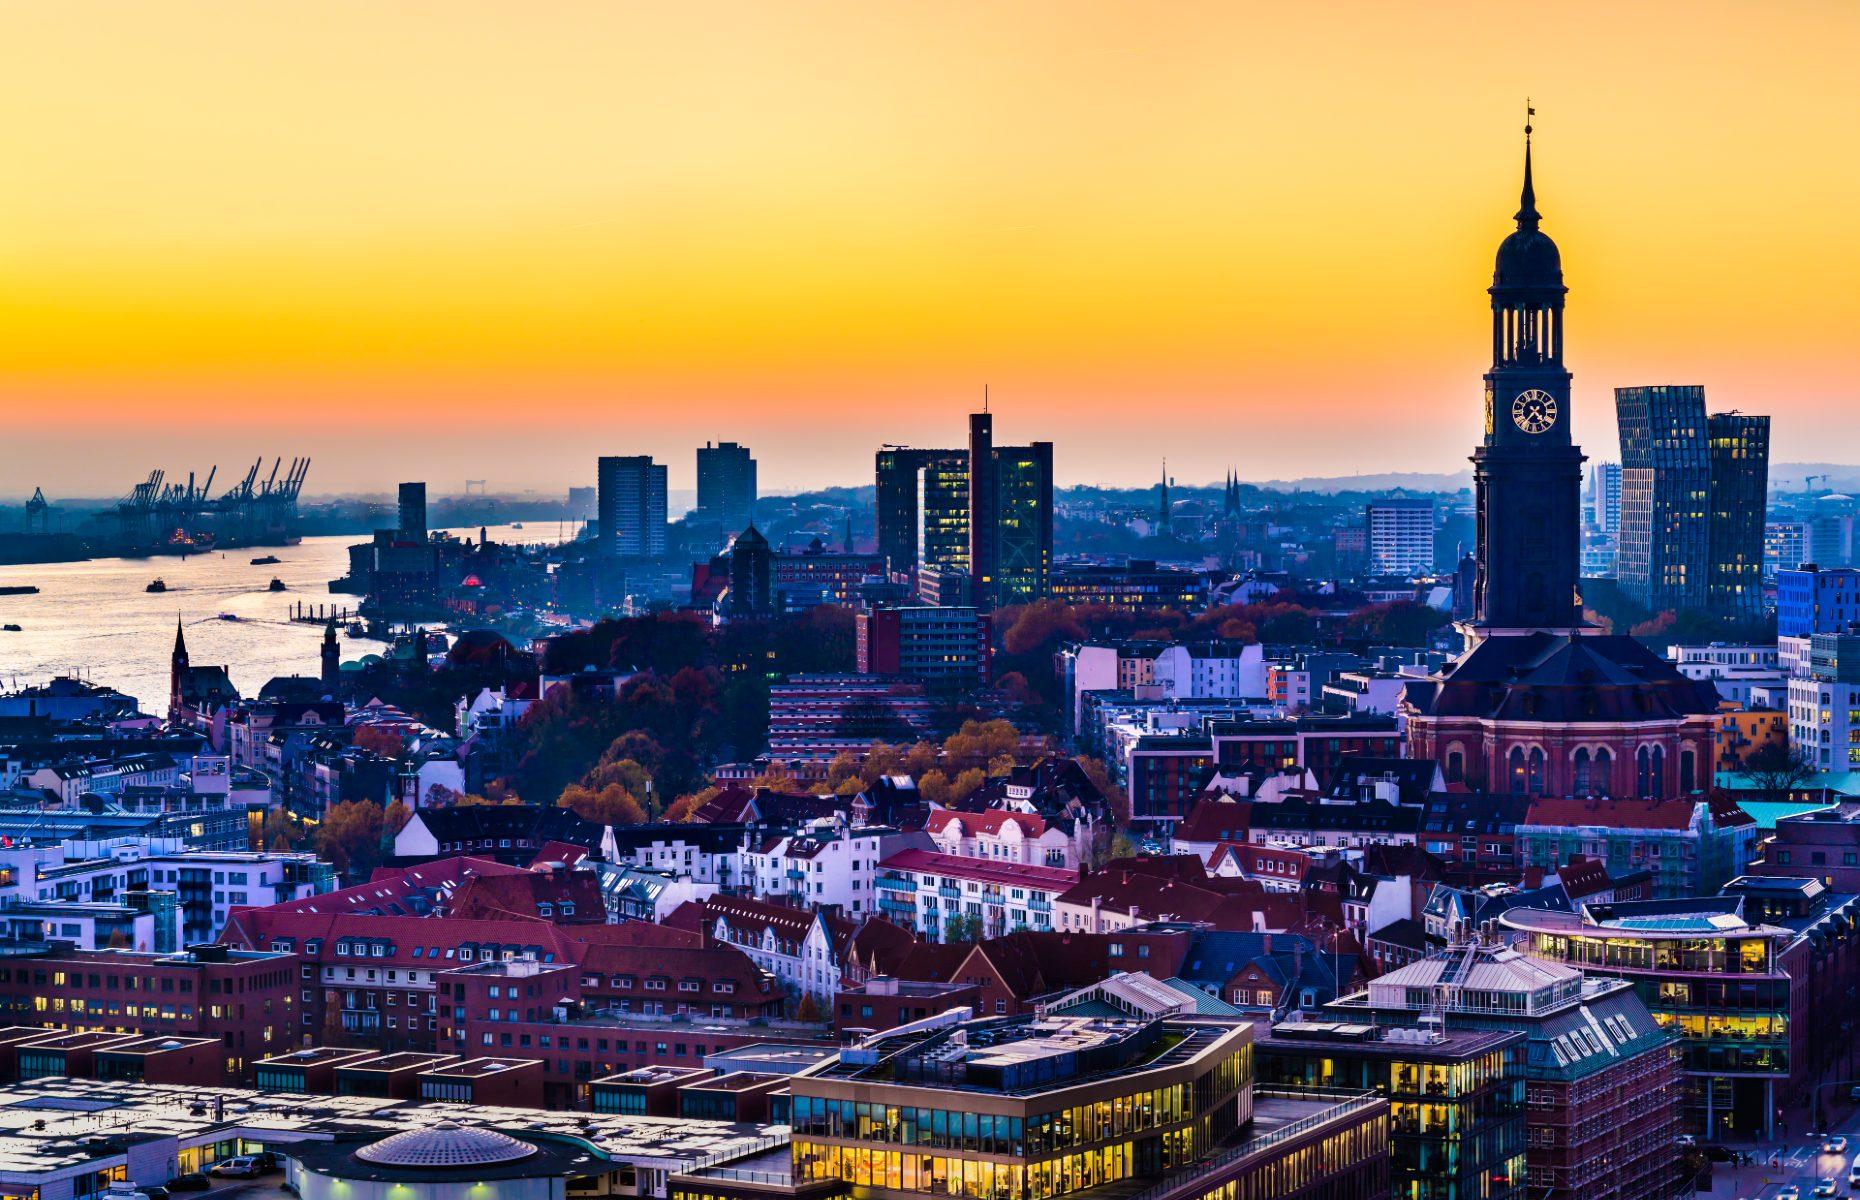 St. Michaelis Church, Hamburg, Germany (Credit: foto-select/Shutterstock)